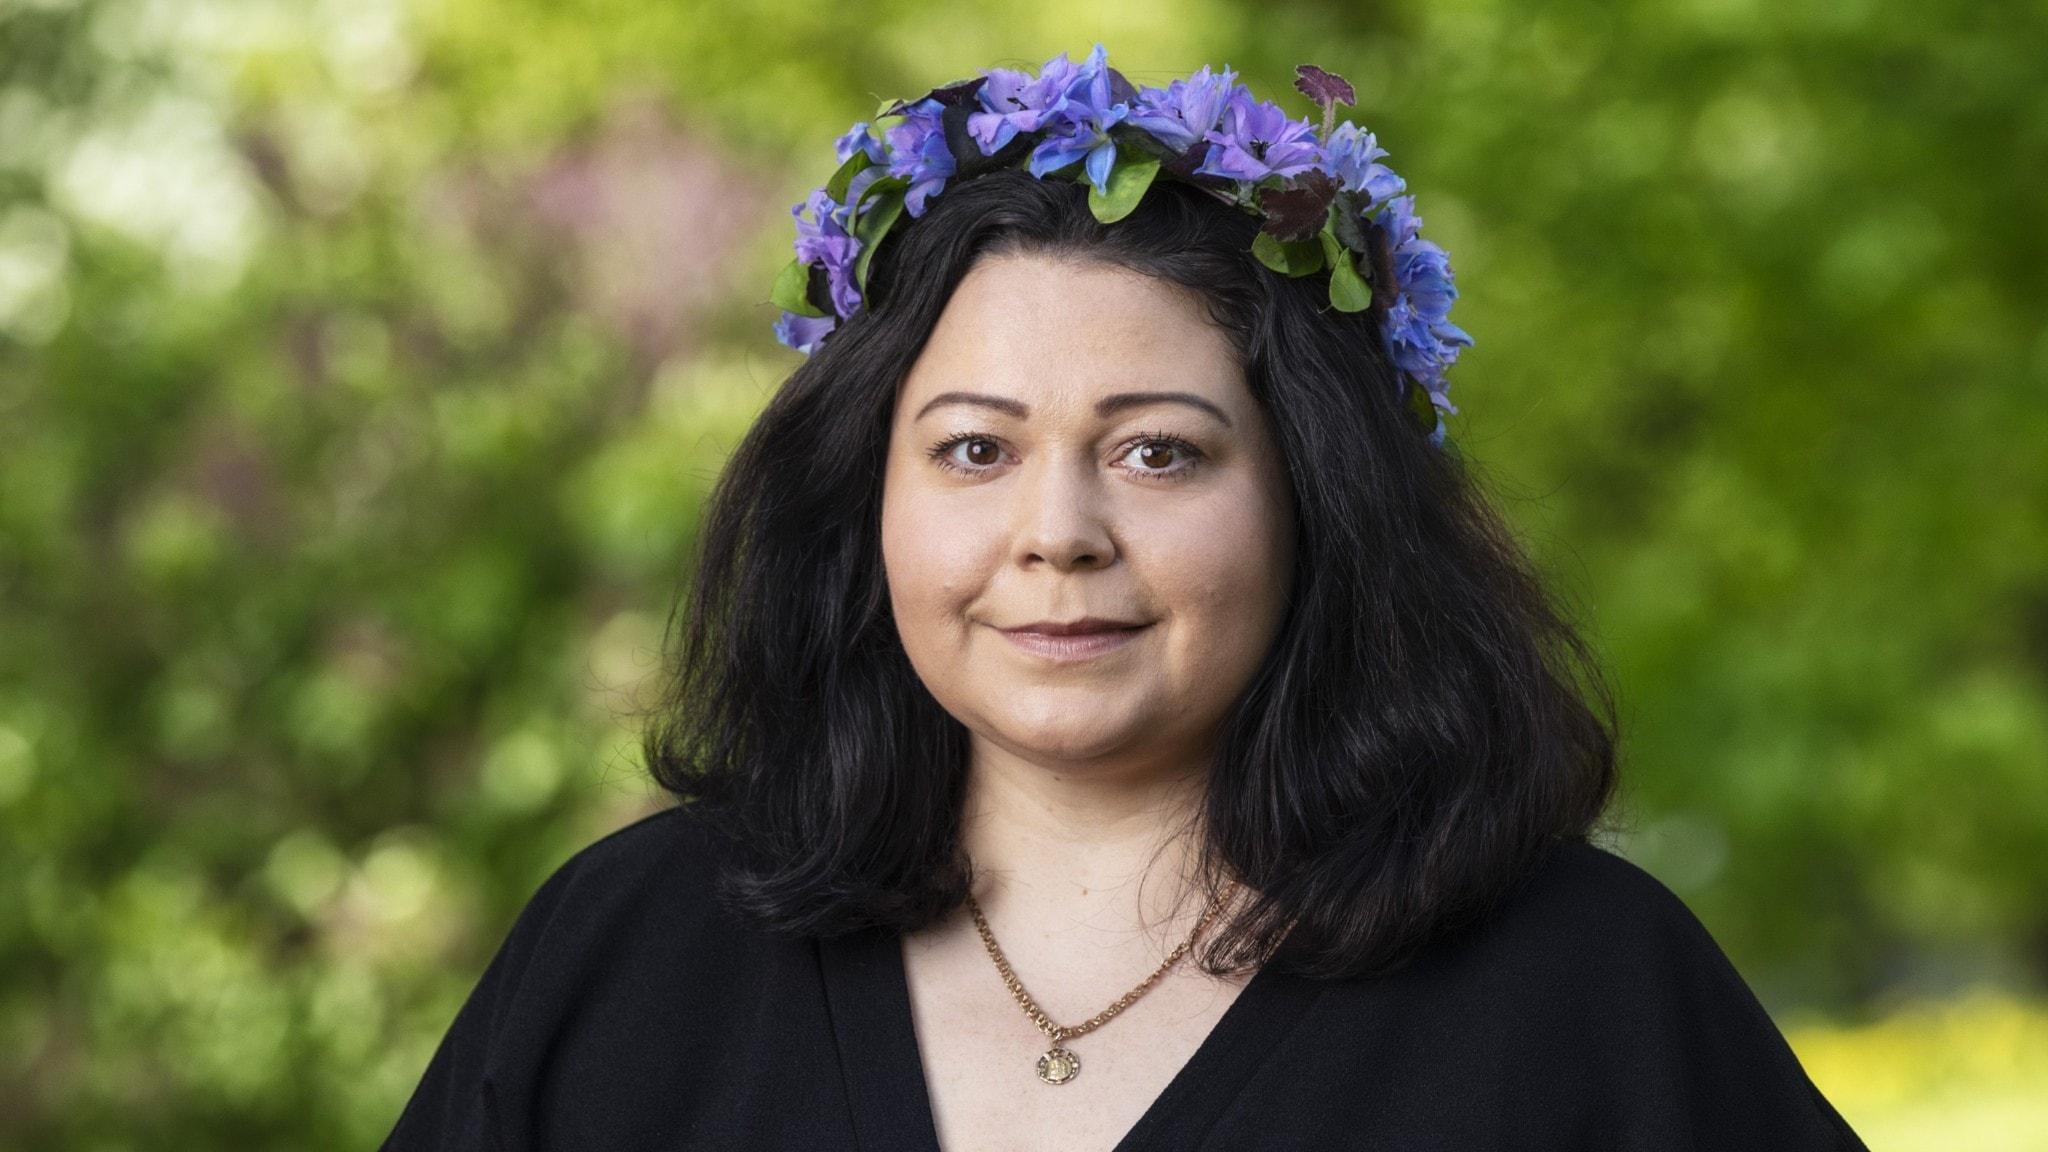 Claudia Olsson i blomsterkrans